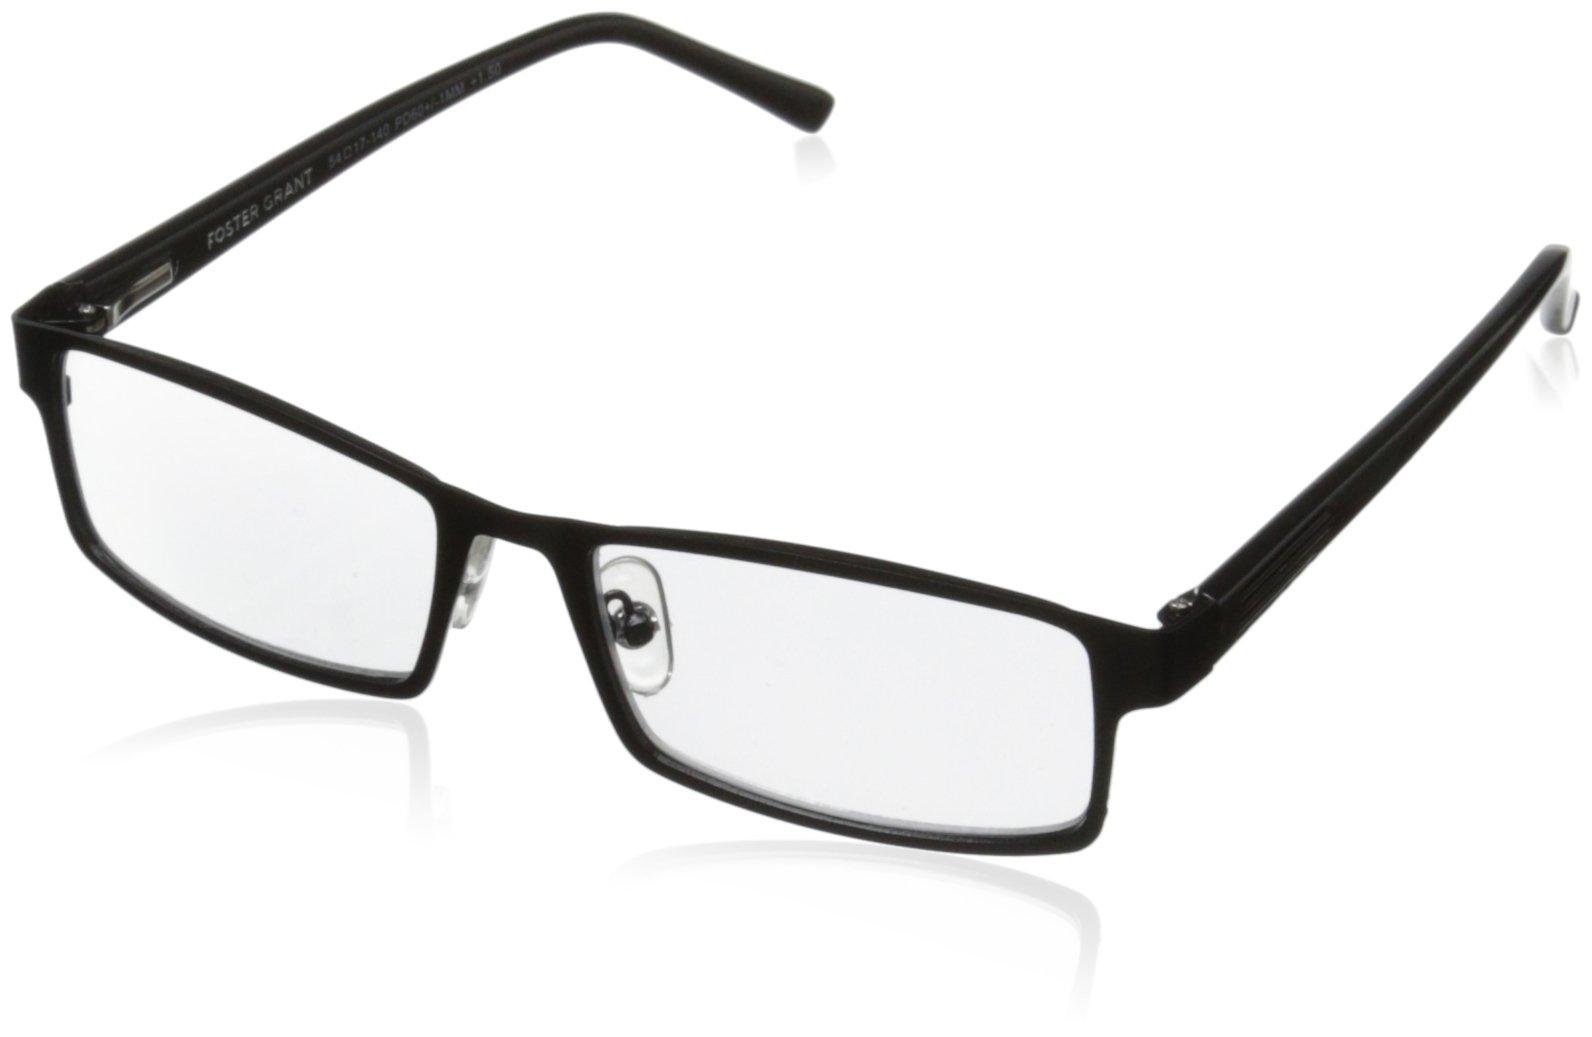 Foster Grant Sawyer Men's Multifocus Glasses, Black, 1.5